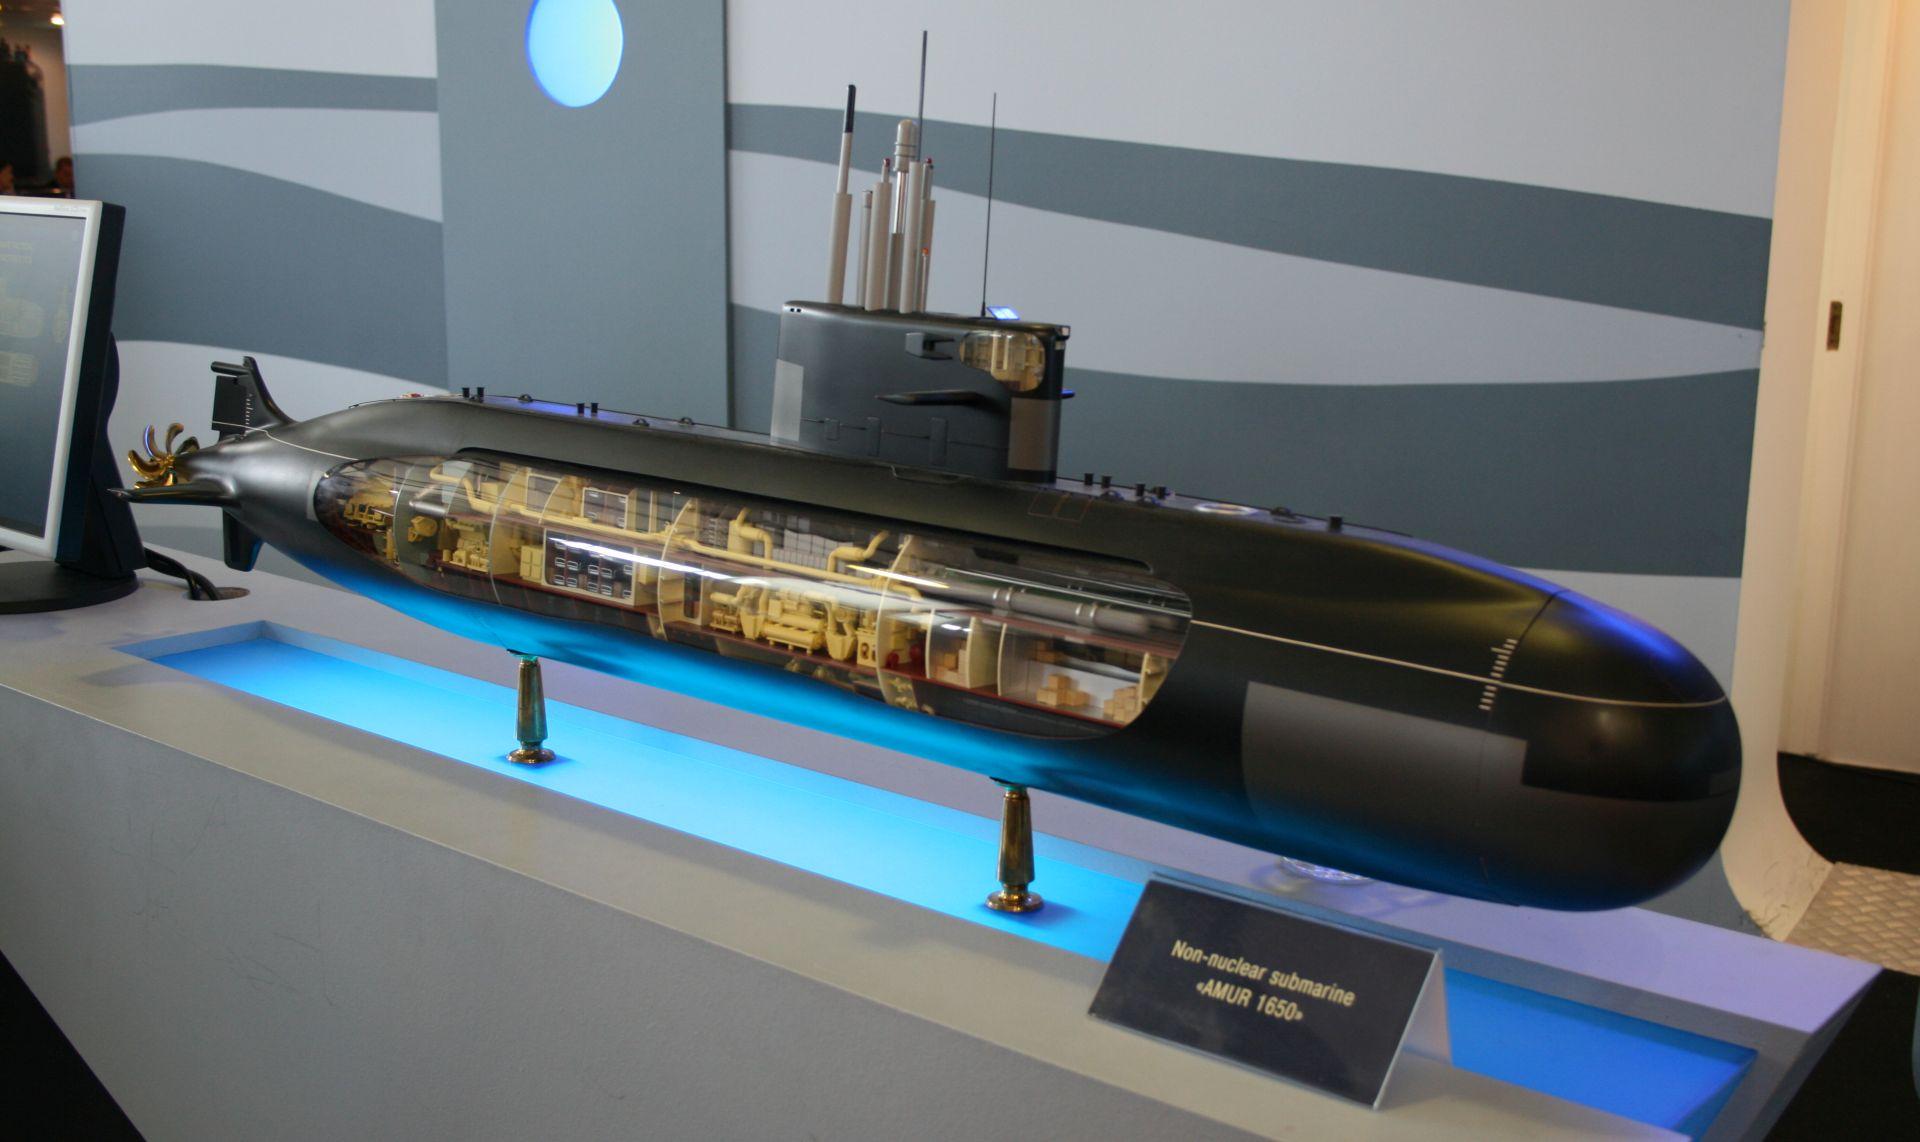 Amur-1650 class submarine